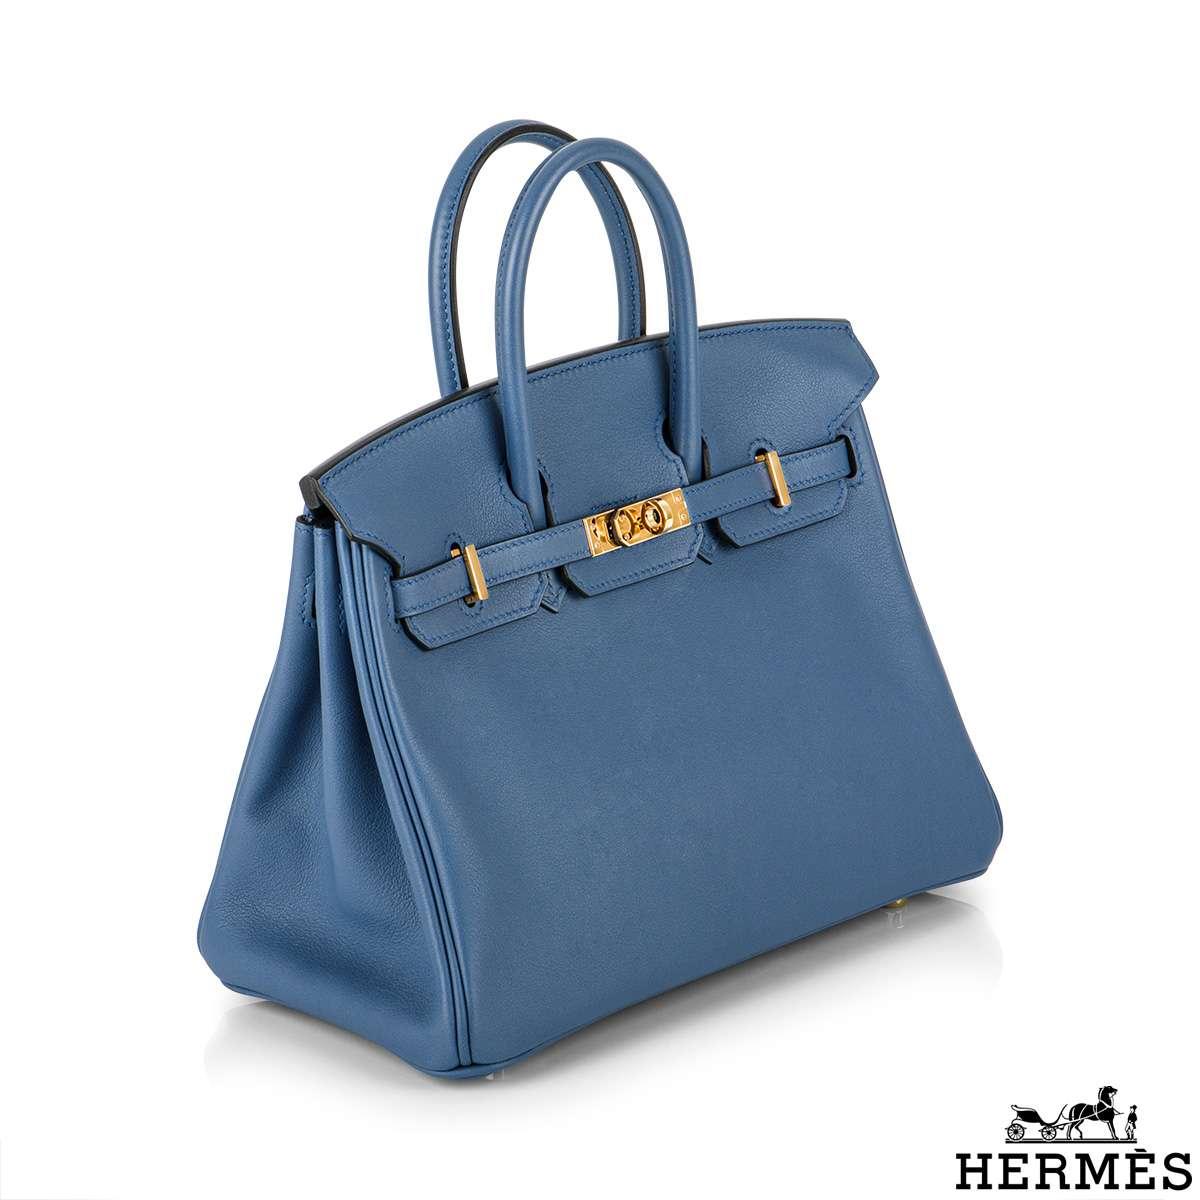 Hermès Birkin 25cm Bleu Paradis GHW Veau Swift Handbag